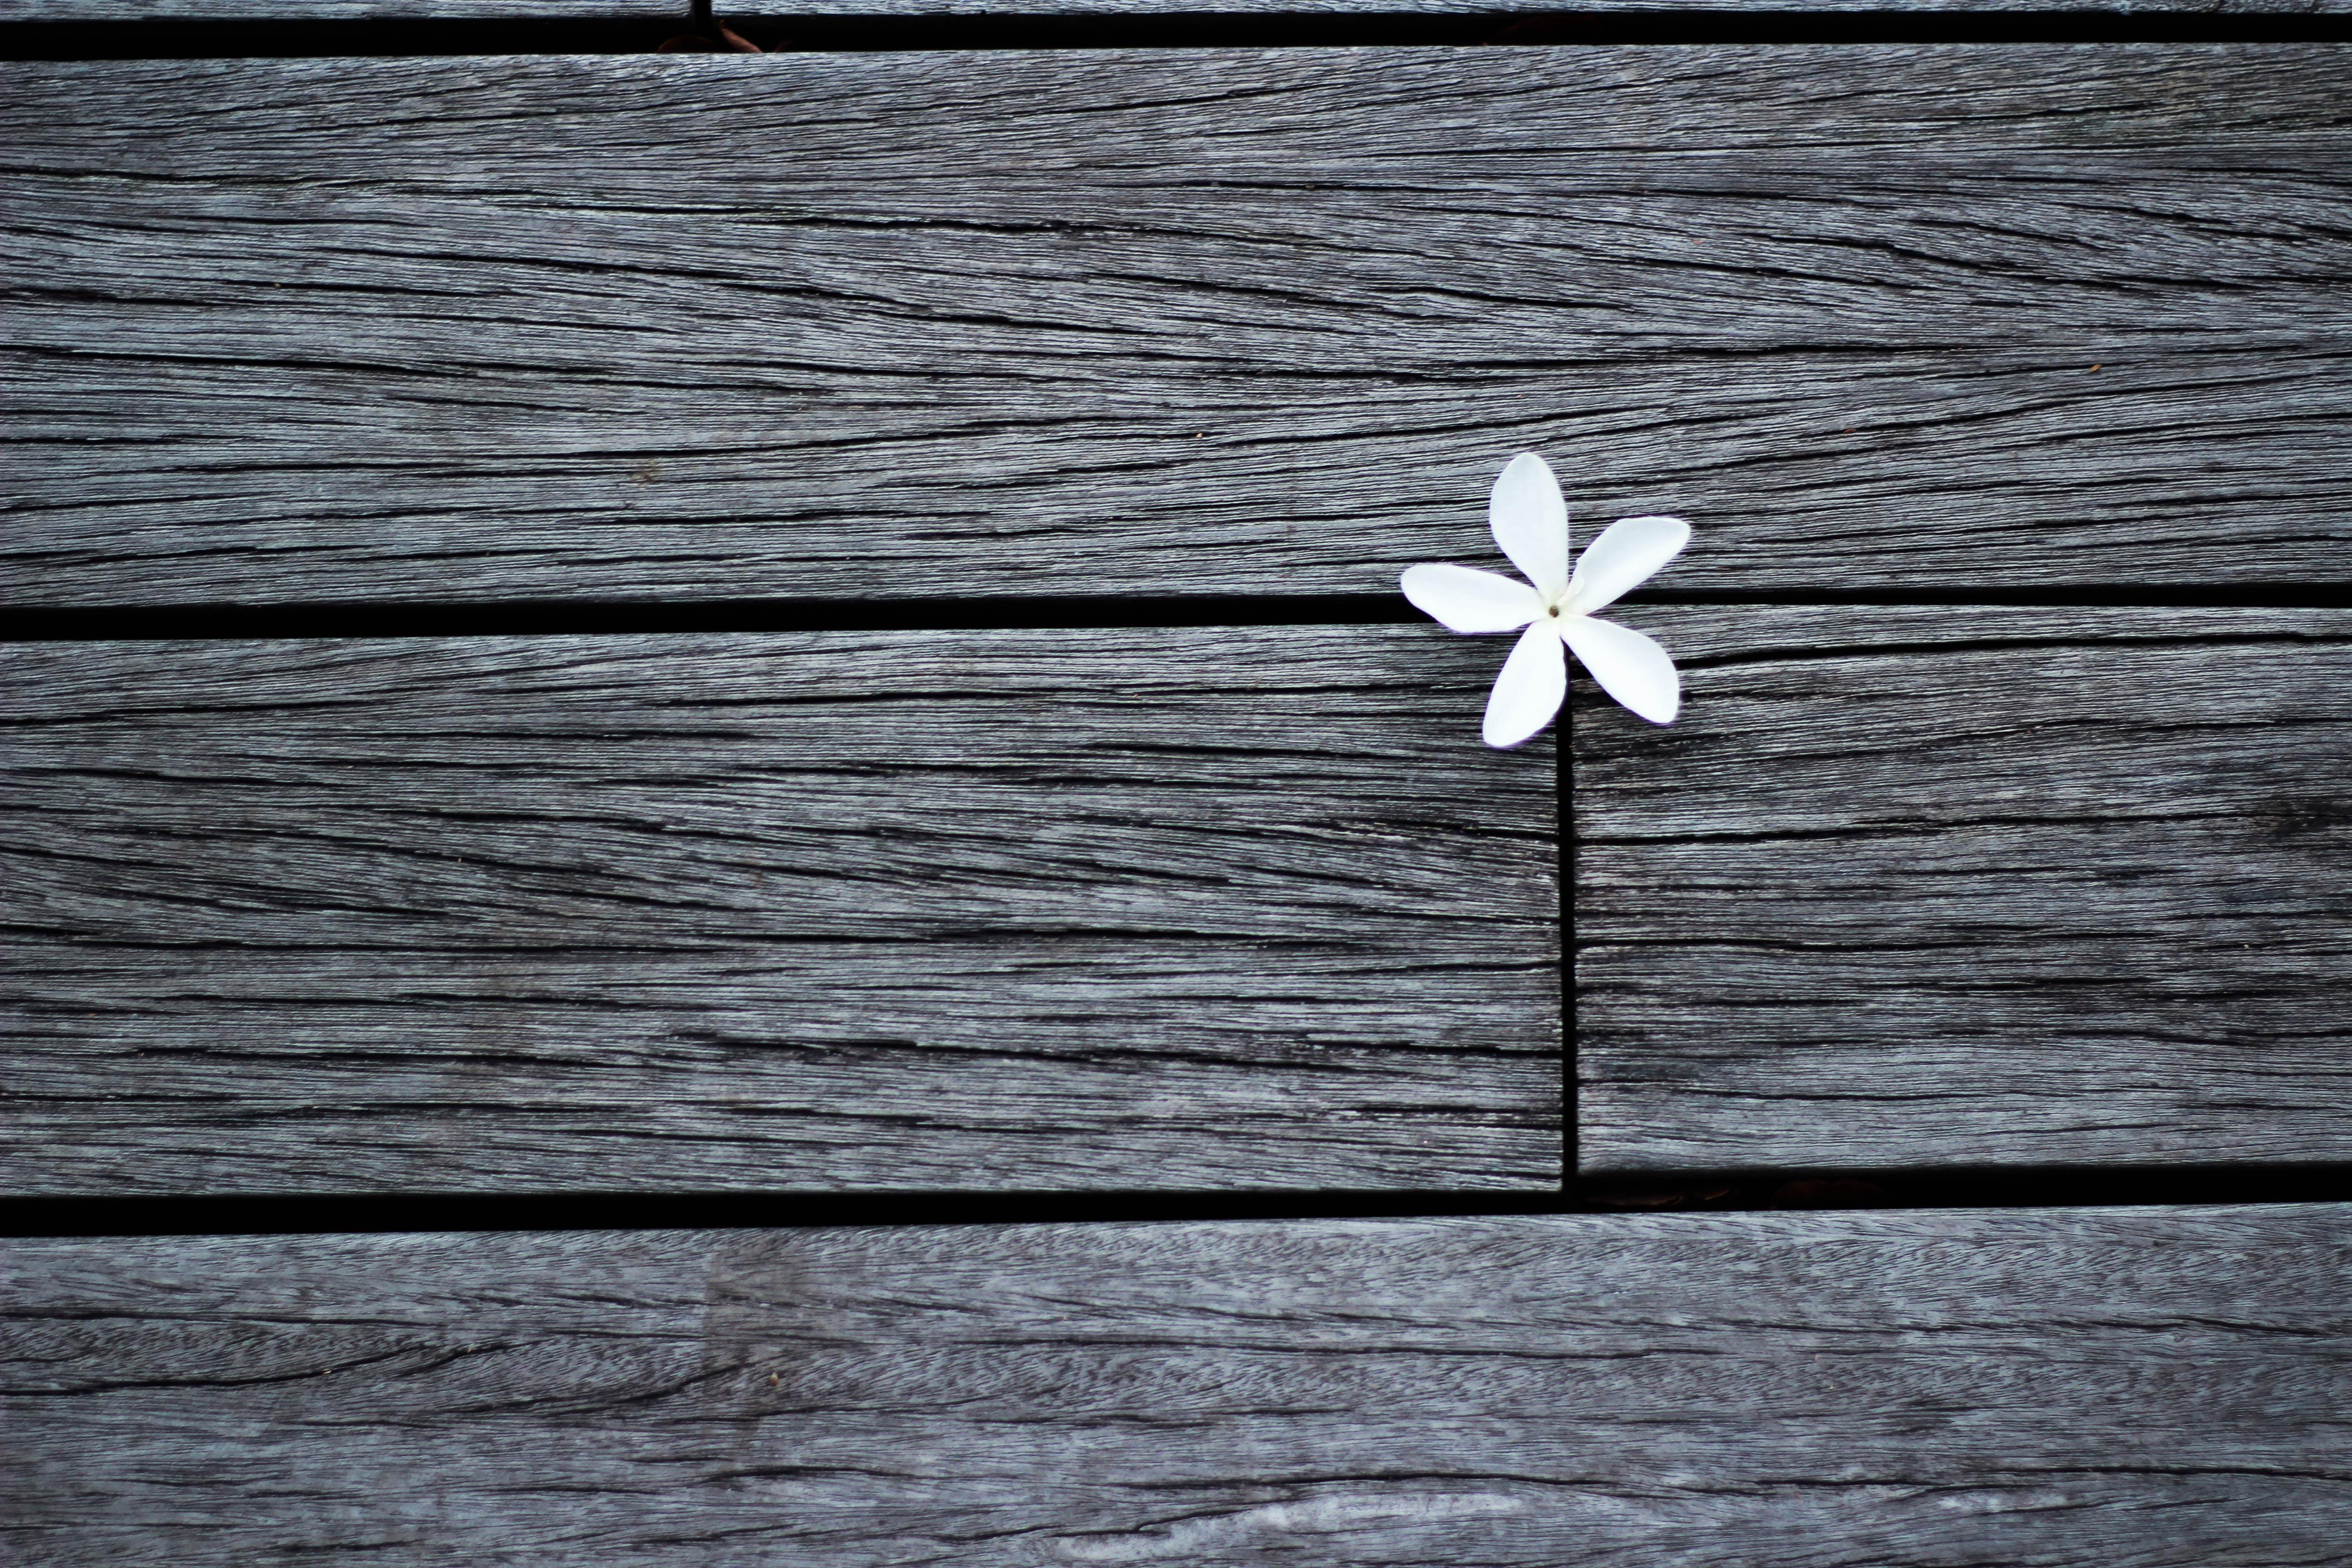 white flower on brown wooden planks